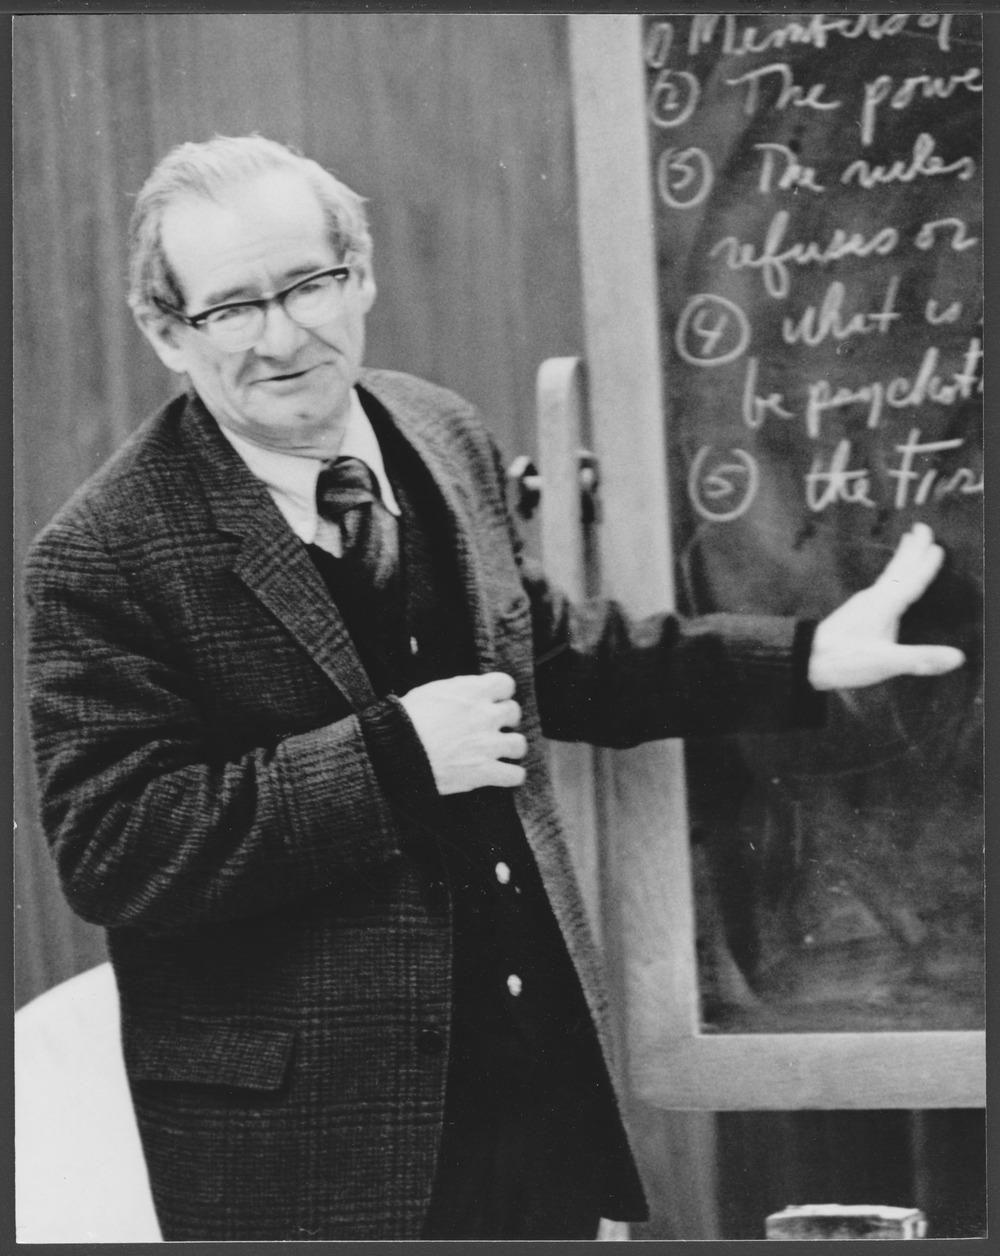 Arthur Mandelbaum, M.S.W. lecturing at the Menninger Foundation, Topeka, Kansas